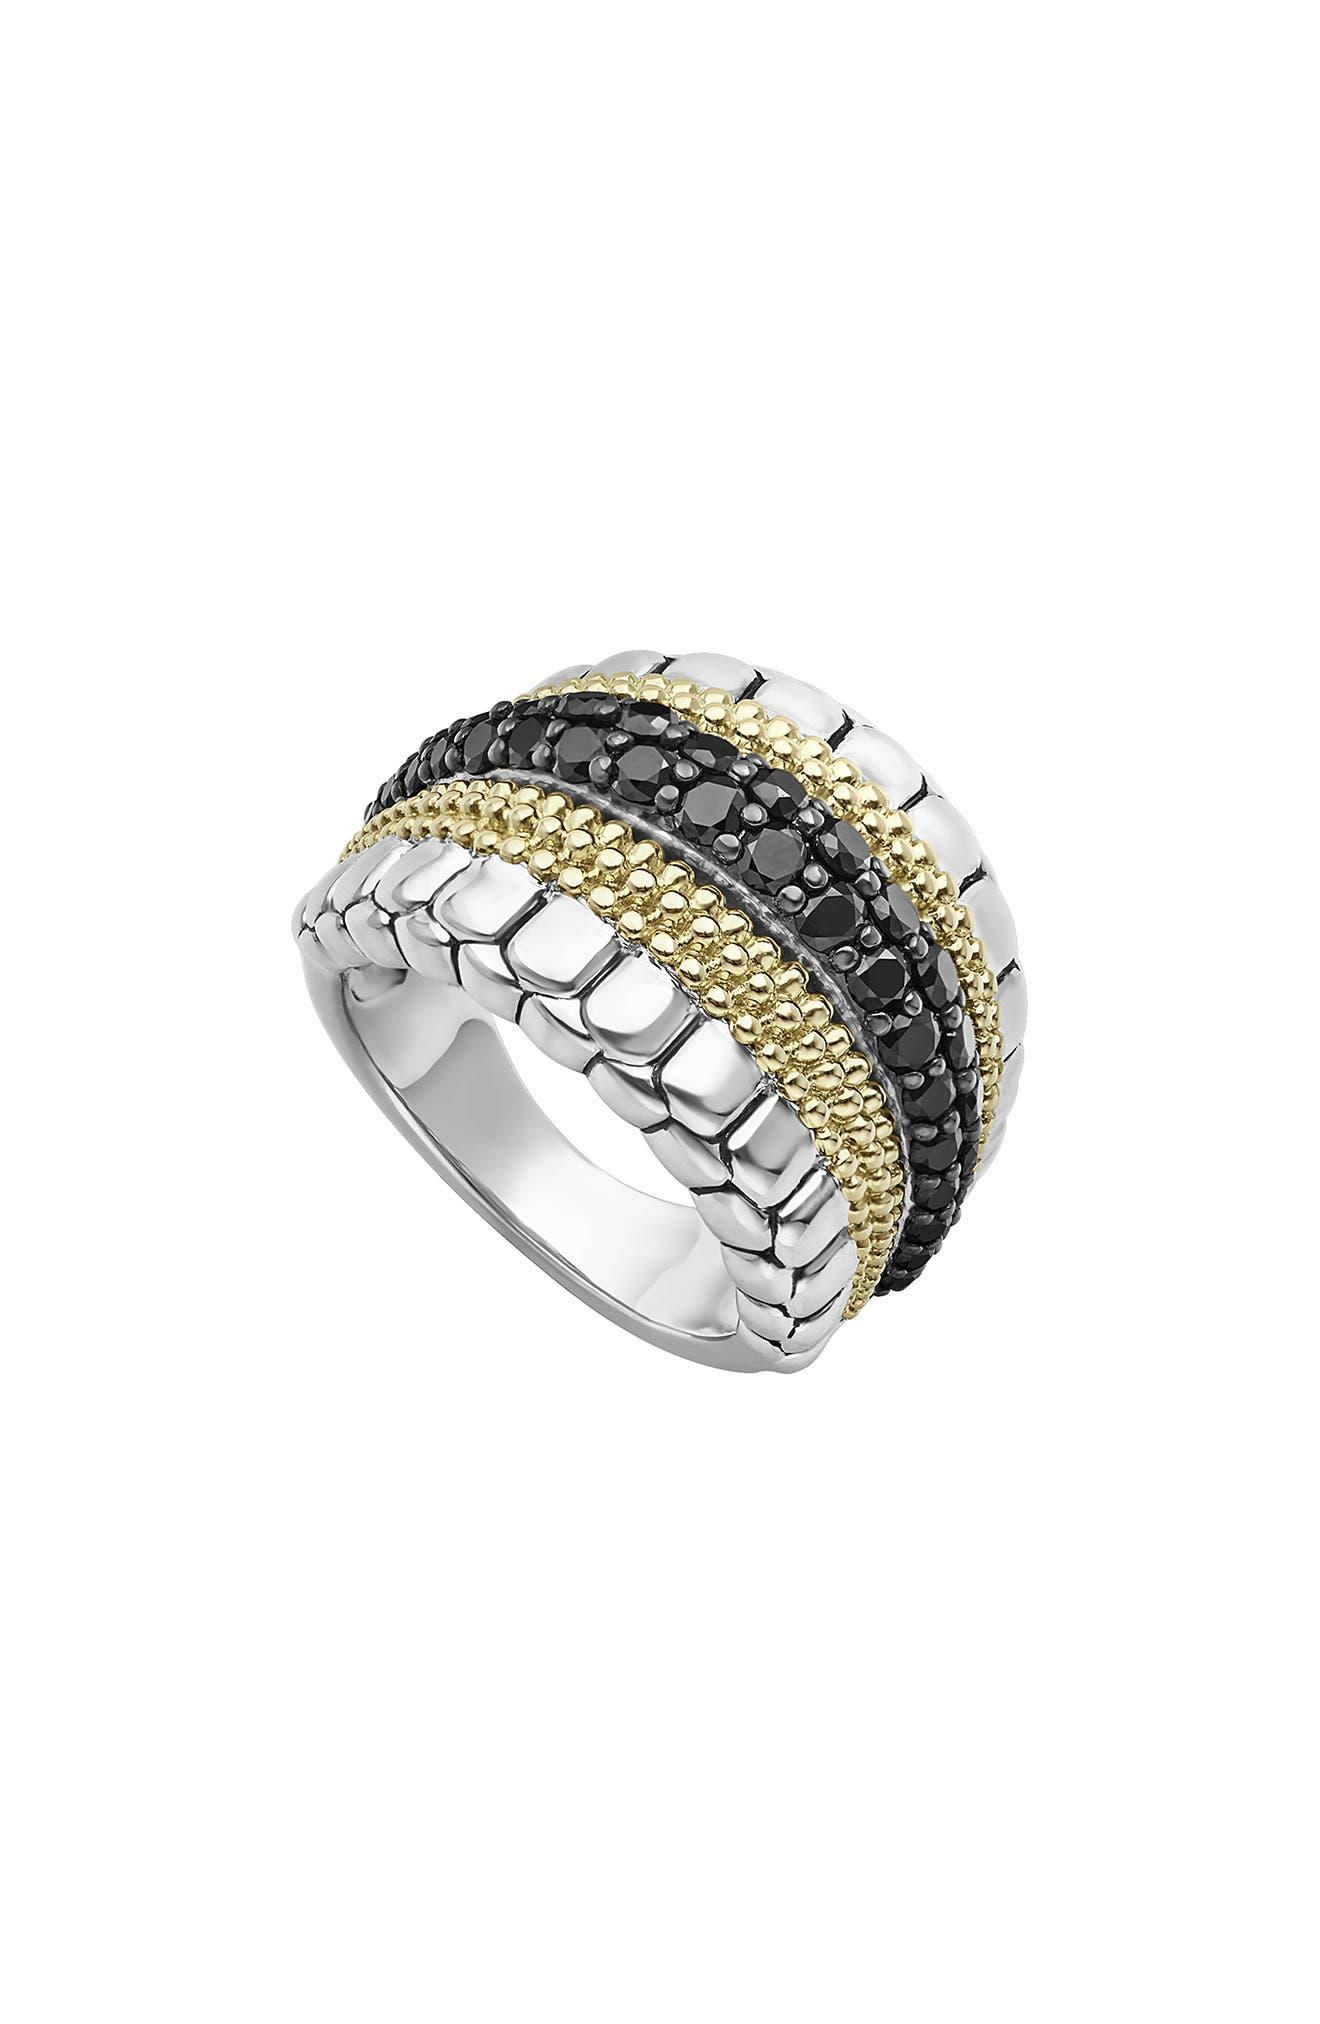 Diamond Lux Black Diamond Band Ring,                             Main thumbnail 1, color,                             SILVER/ GOLD/ BLACK DIAMOND